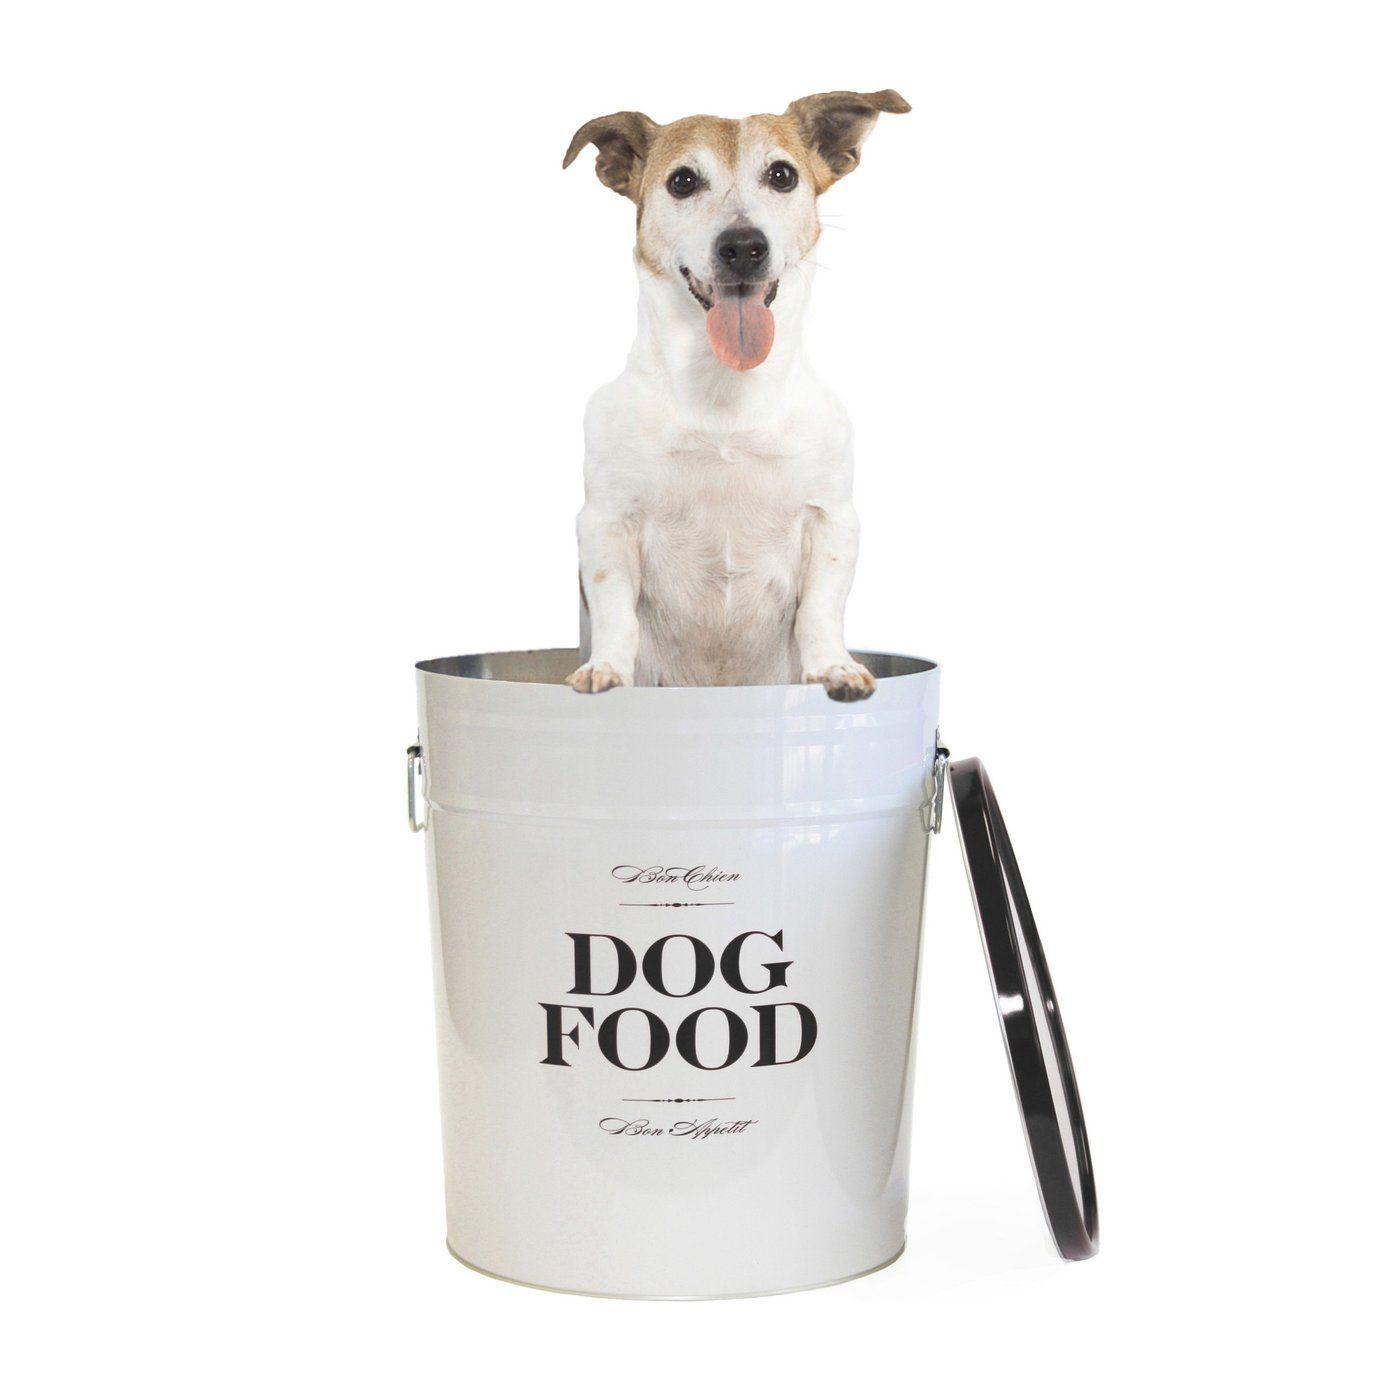 Bon chien dog food storage canister in 2020 dog food